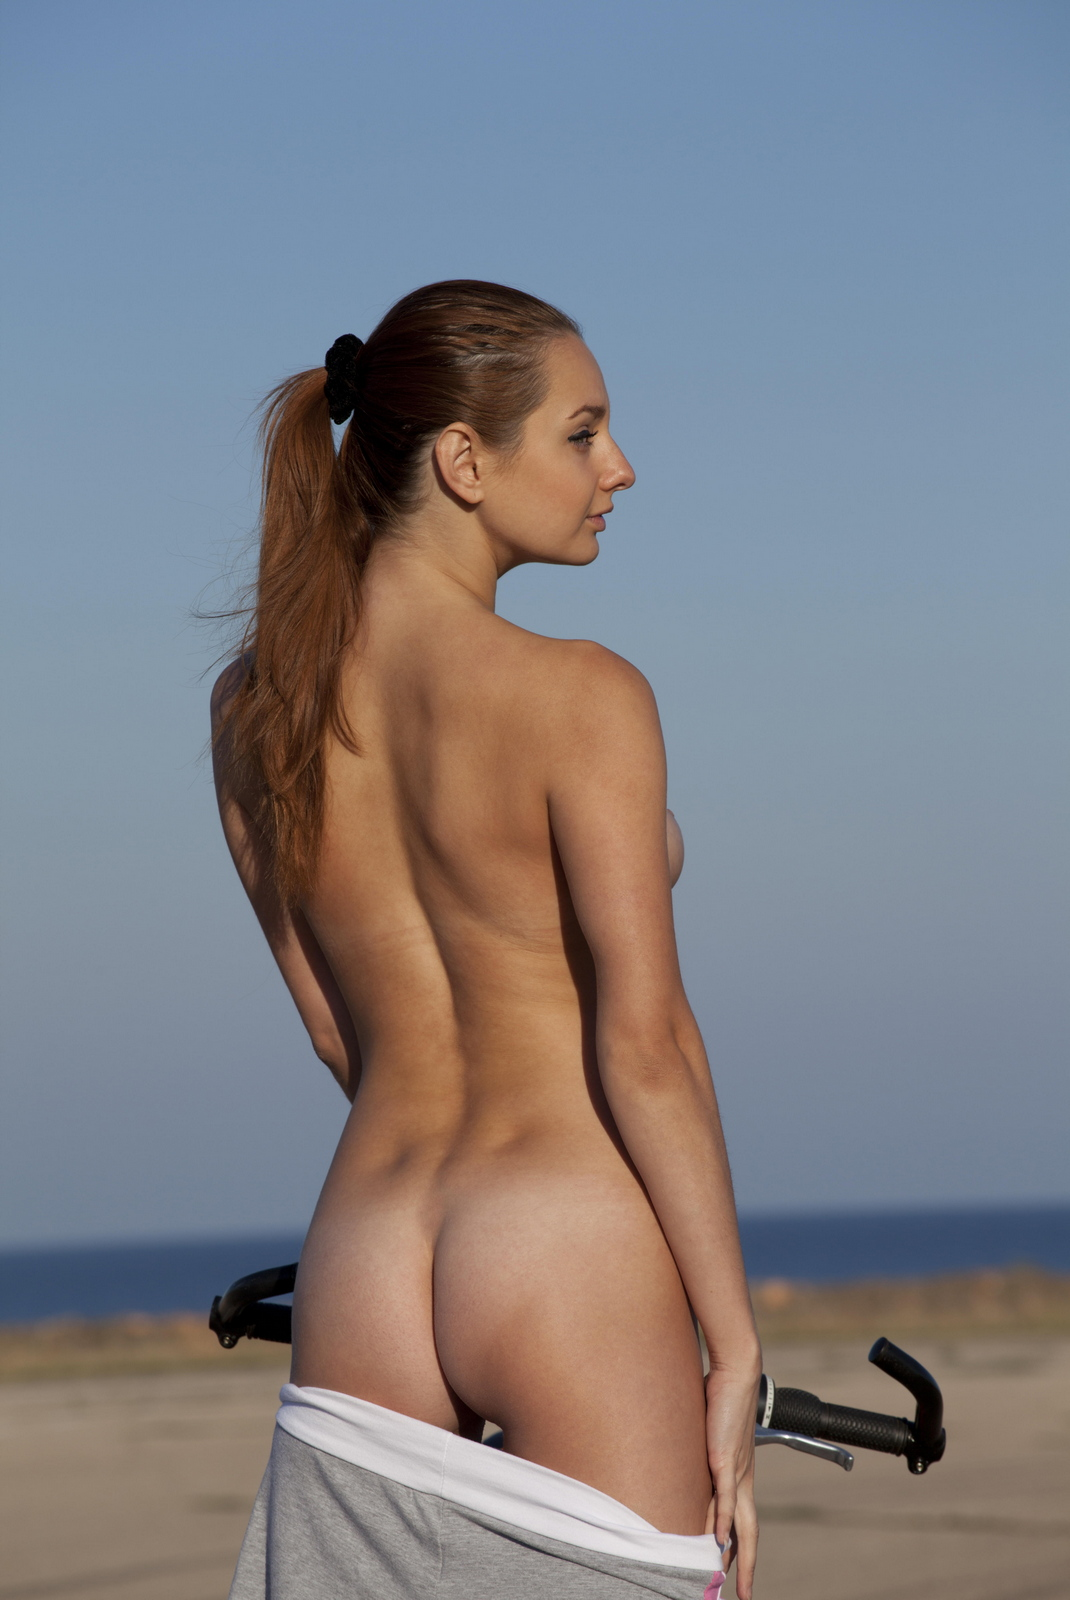 mishel-c-bicycle-boobs-naked-domai-09